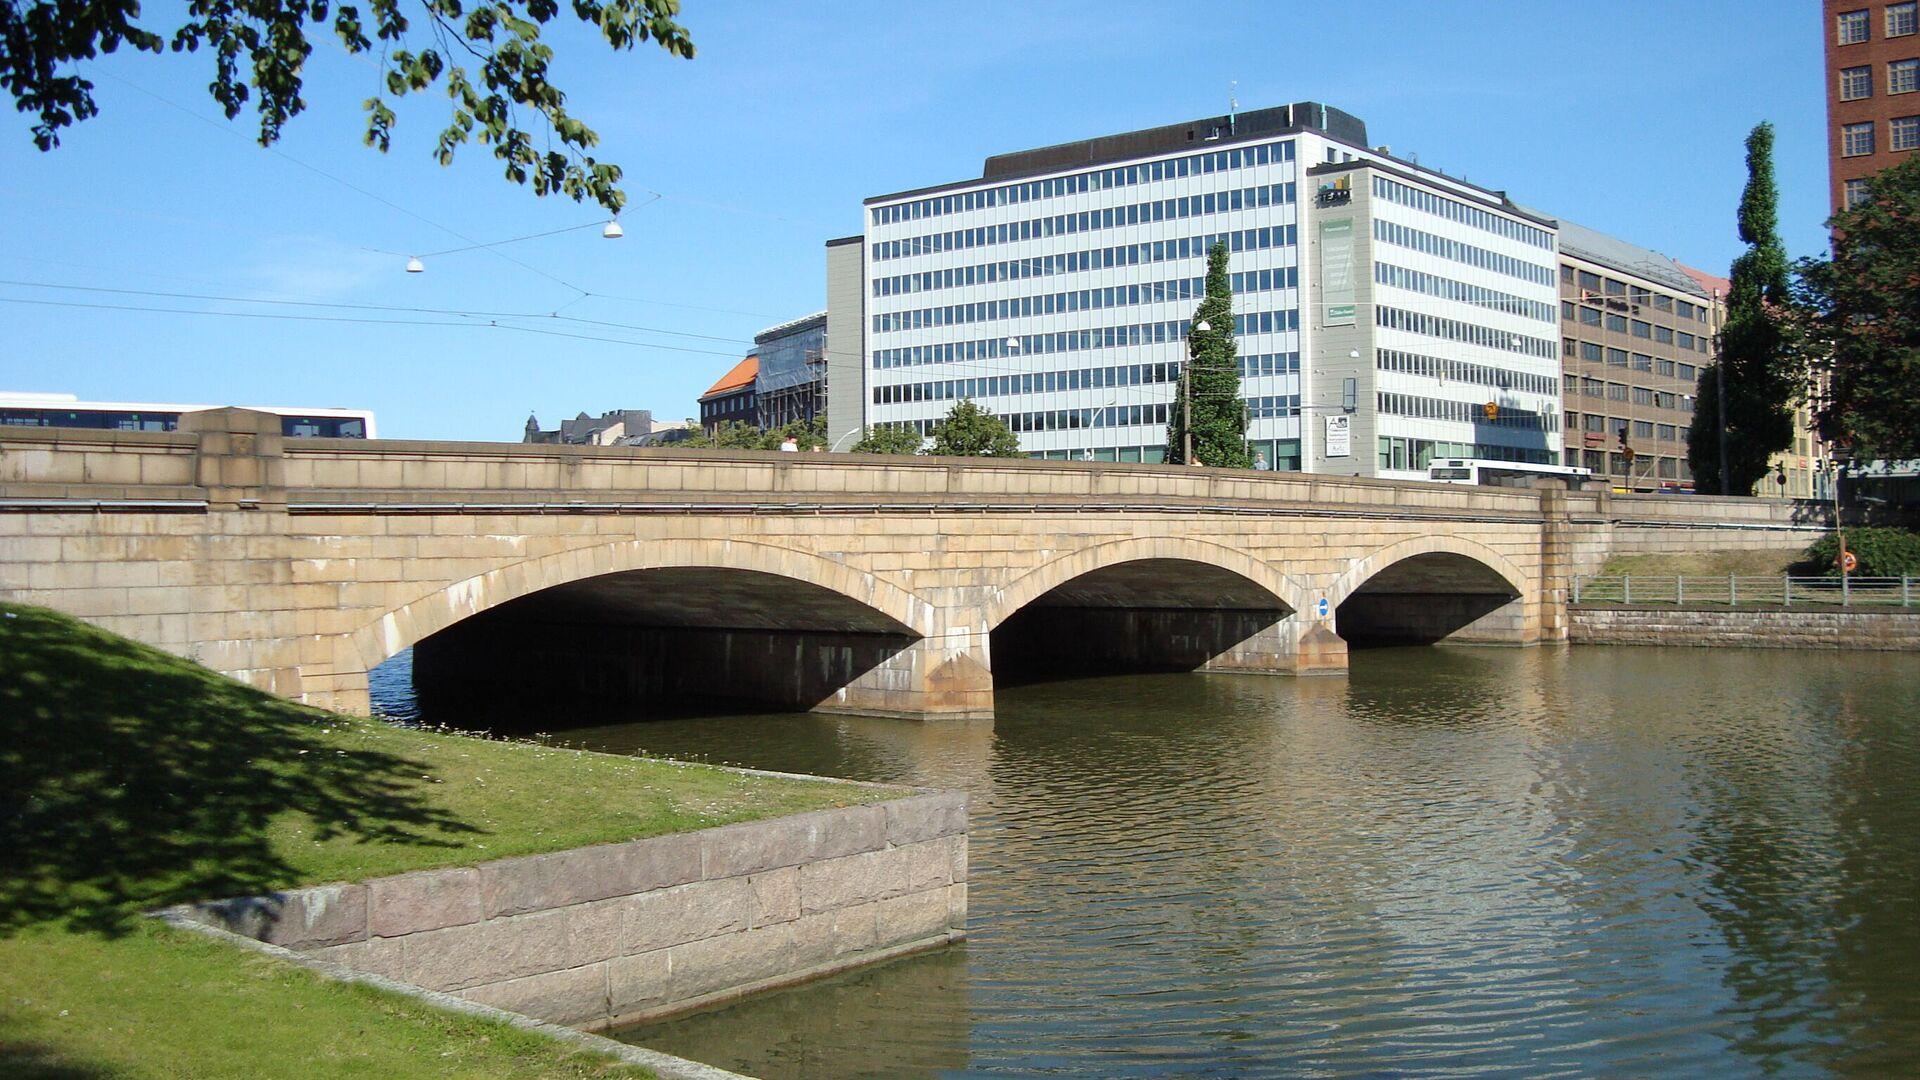 Pitkäsilta (Lange Brücke) in Helsinki - SNA, 1920, 07.10.2021